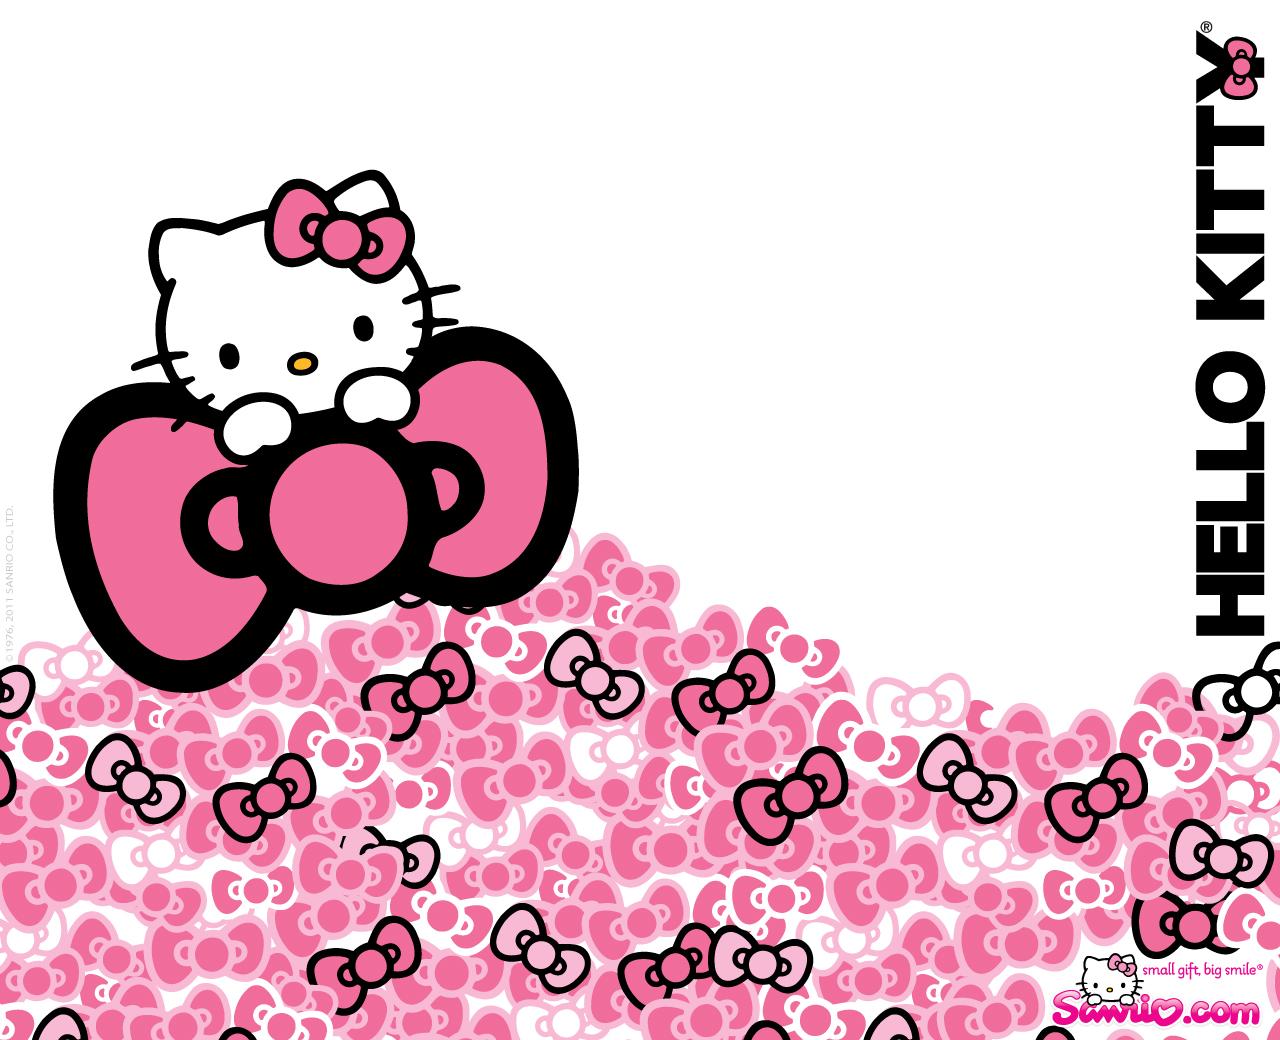 Namn:  Hello-kitty-Wallpapers-From-Sanrio-Website.jpg Visningar: 818 Storlek:  621.8 KB